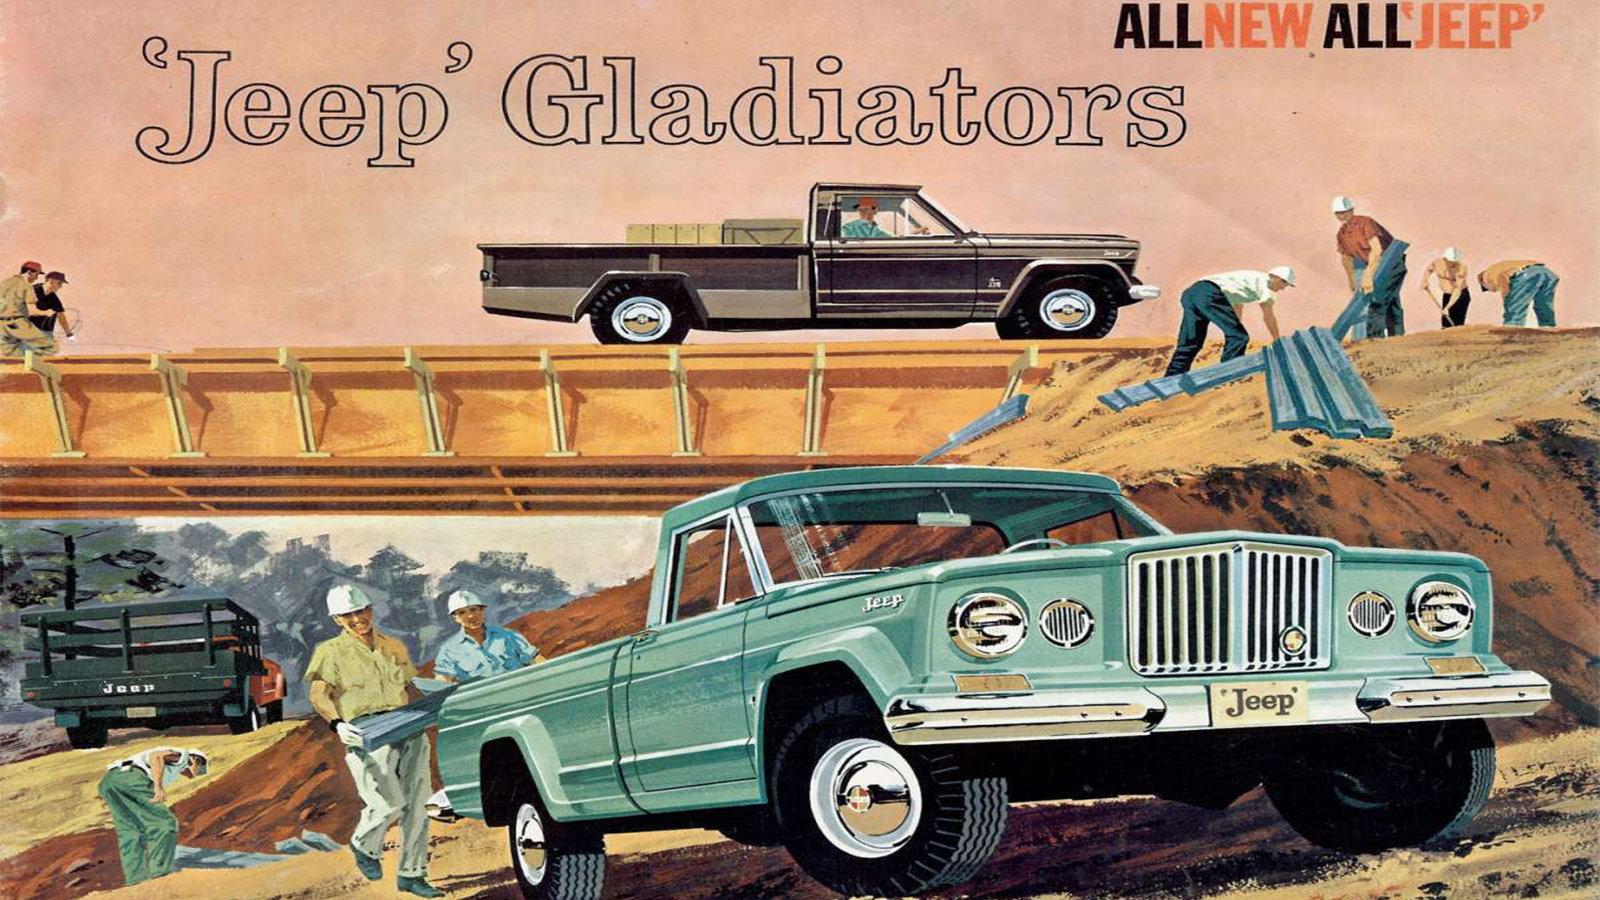 Jeep Gladiator, Handsome, Hardy